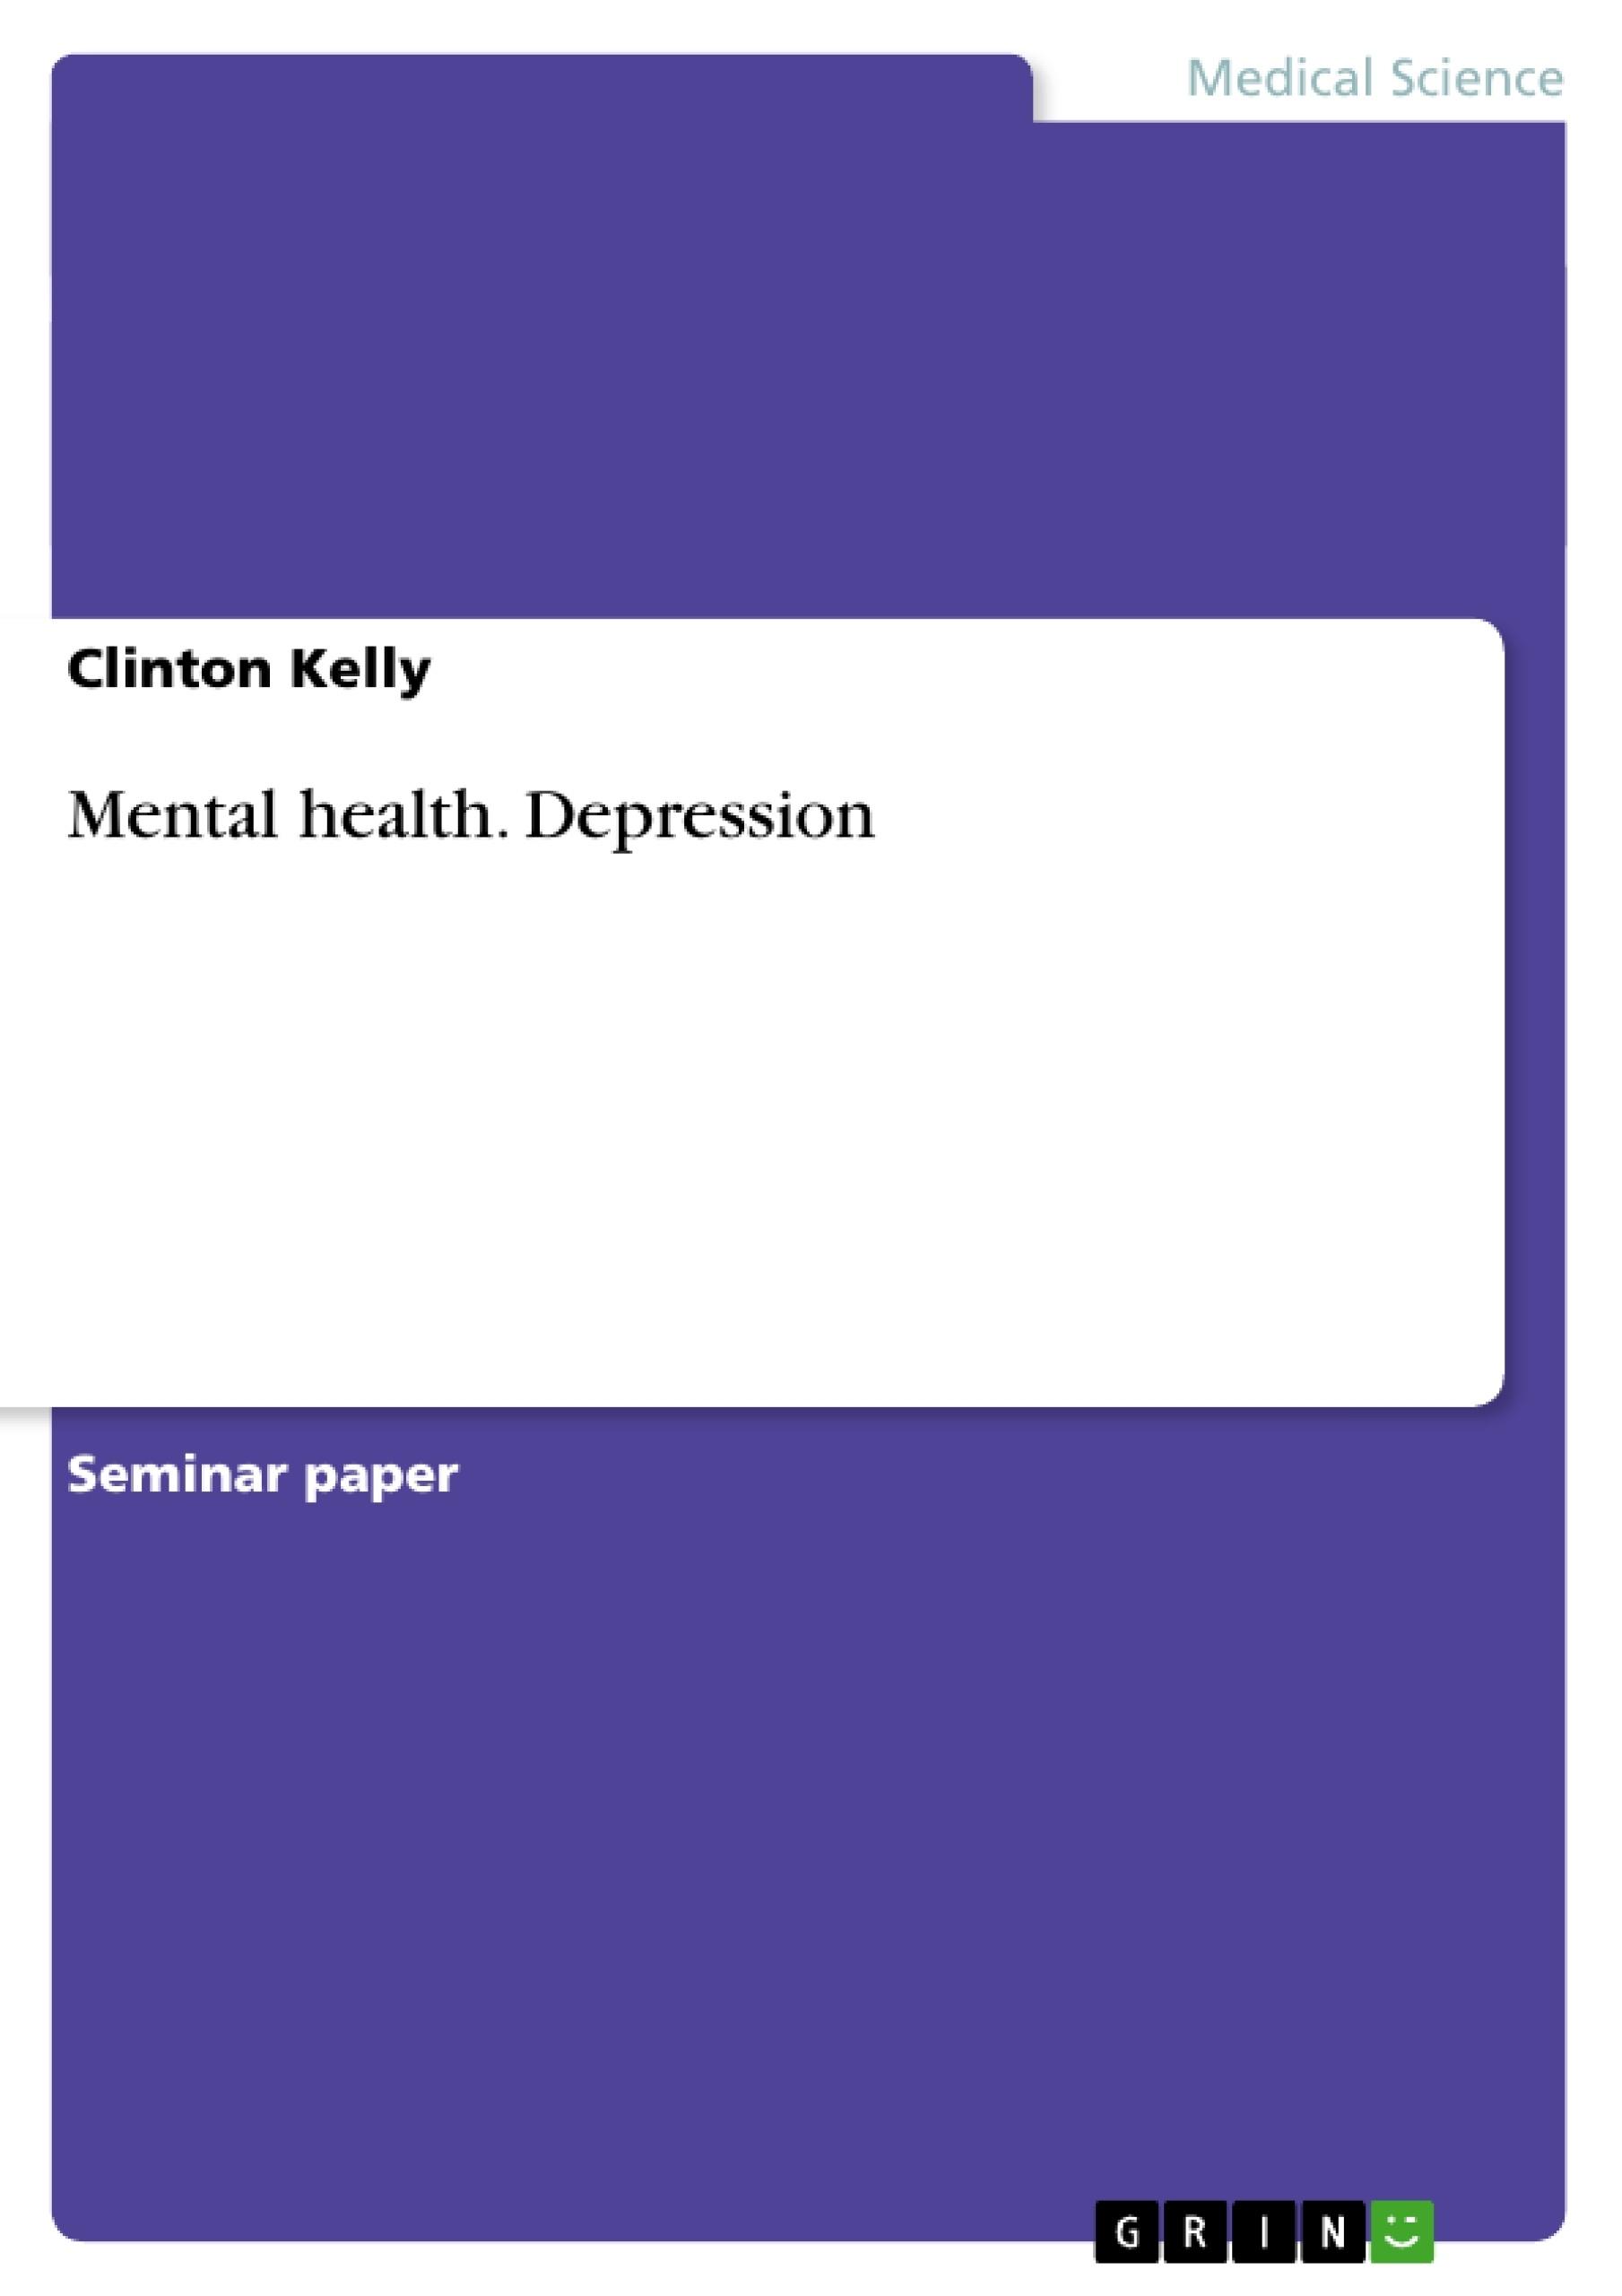 Title: Mental health. Depression